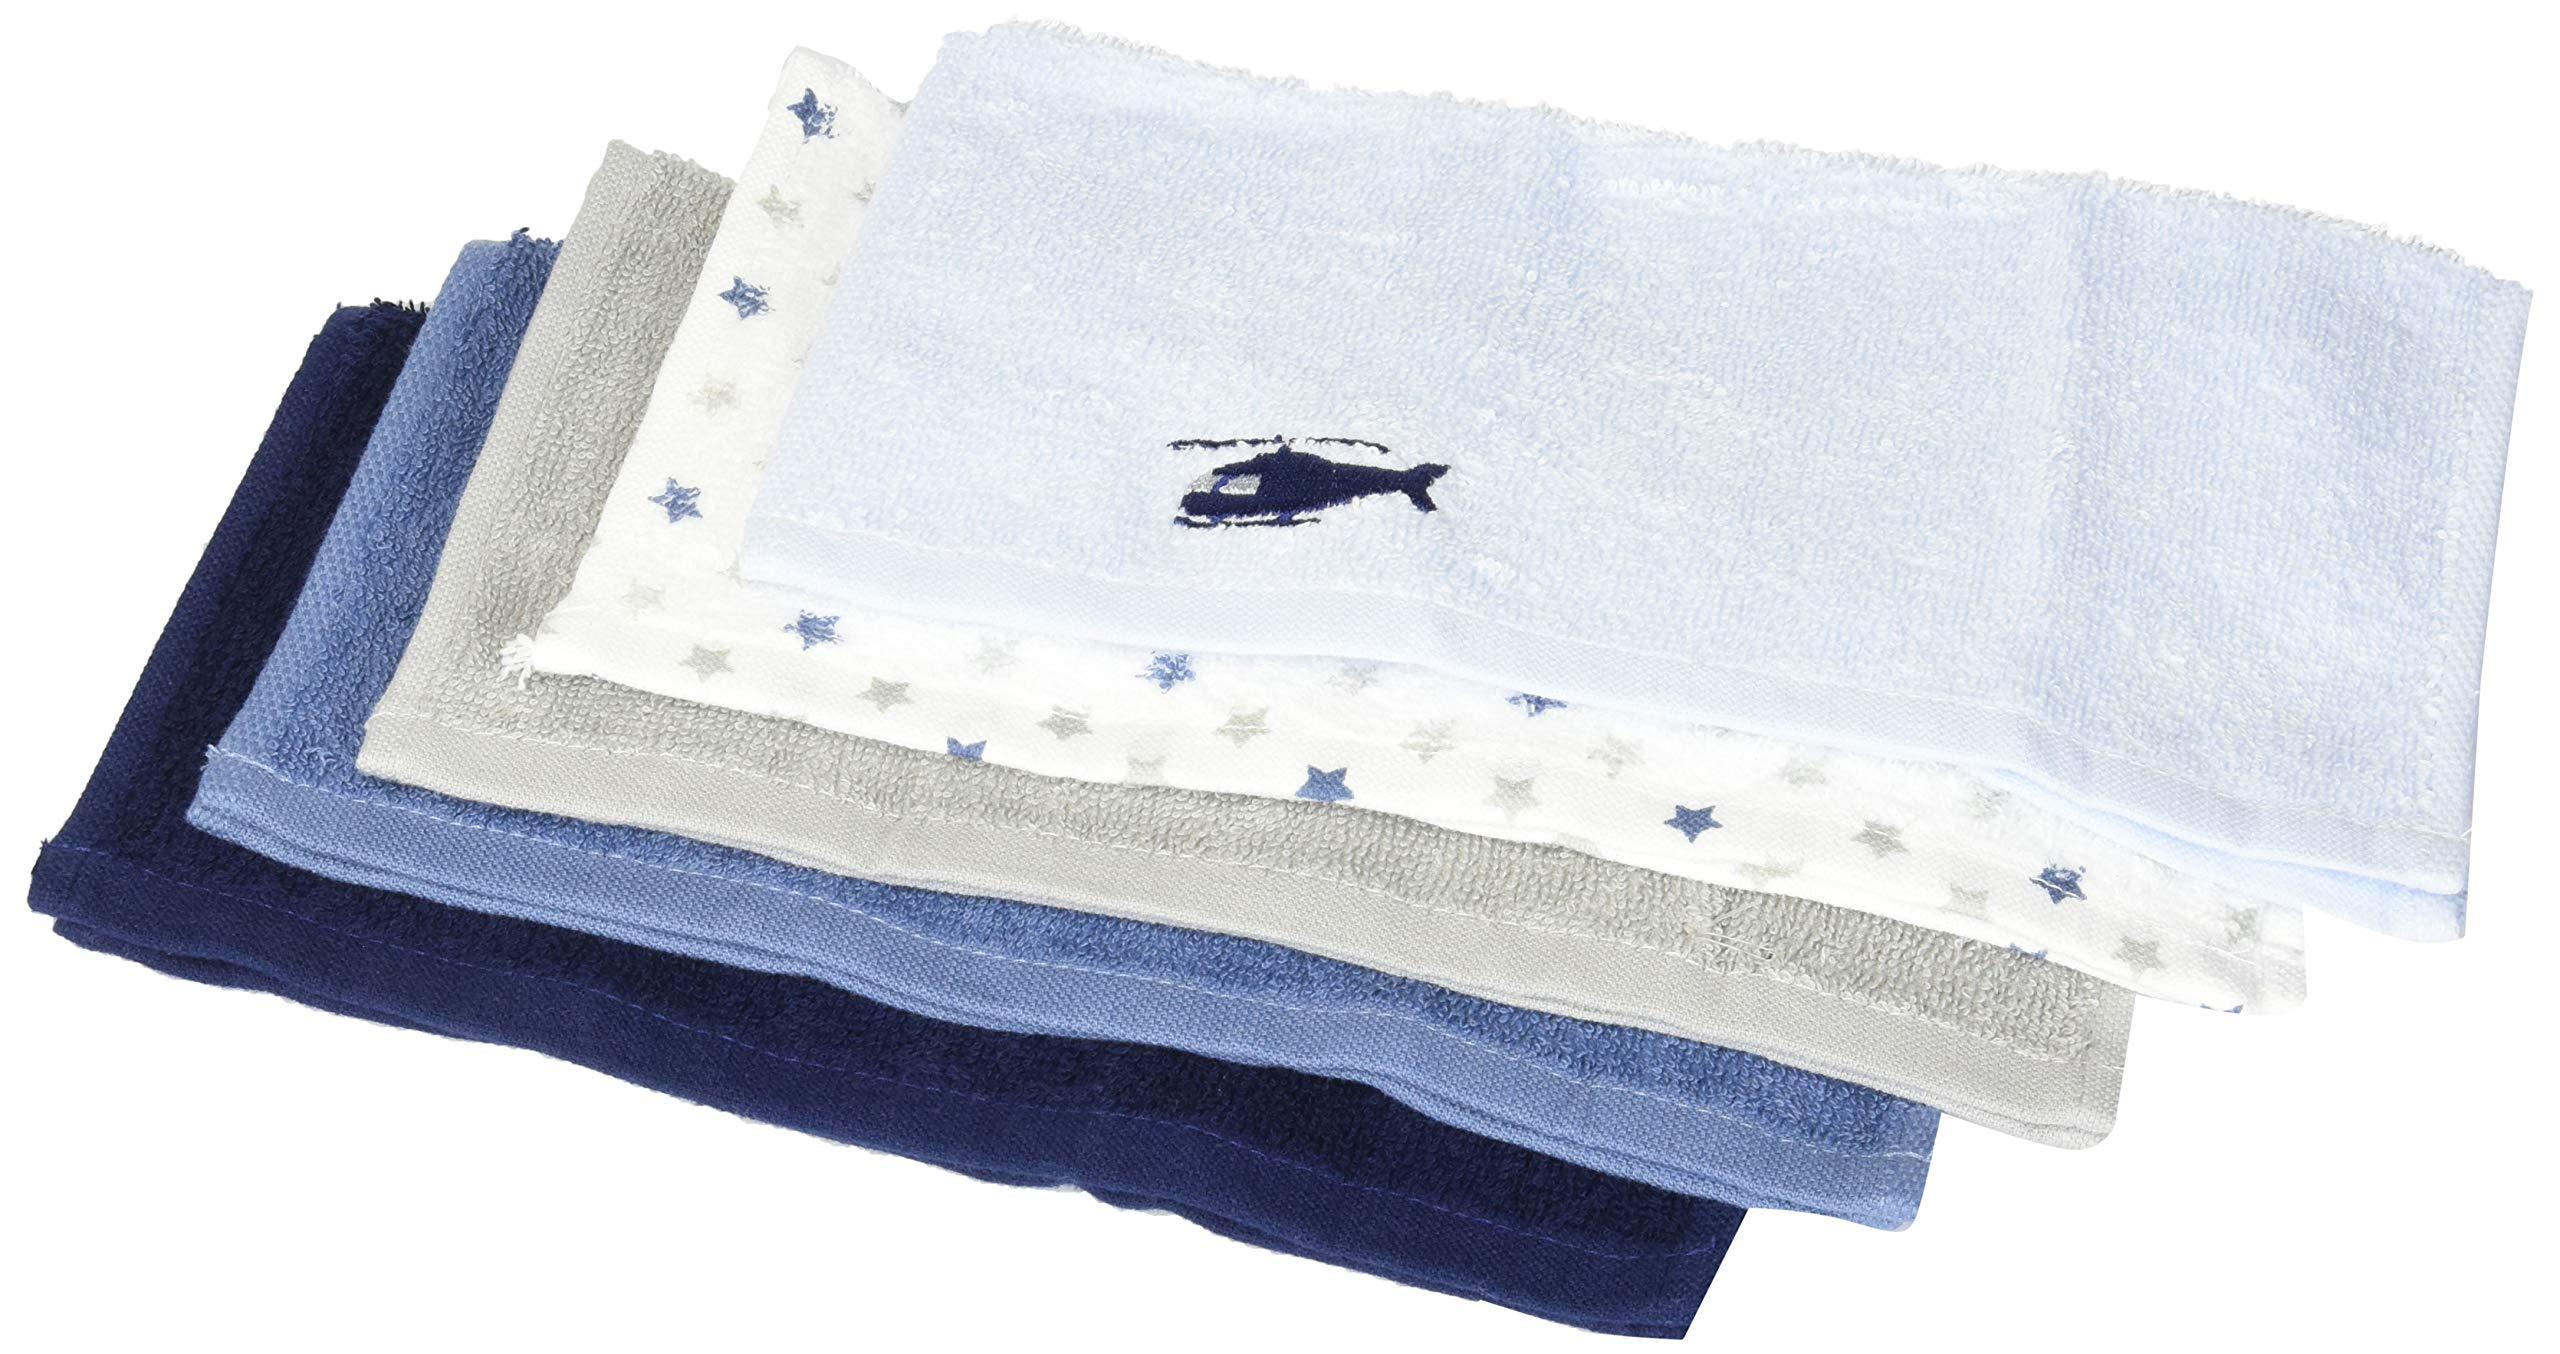 Hudson Baby Unisex Baby Super Soft Cotton Washcloths, Helicopter, One Size